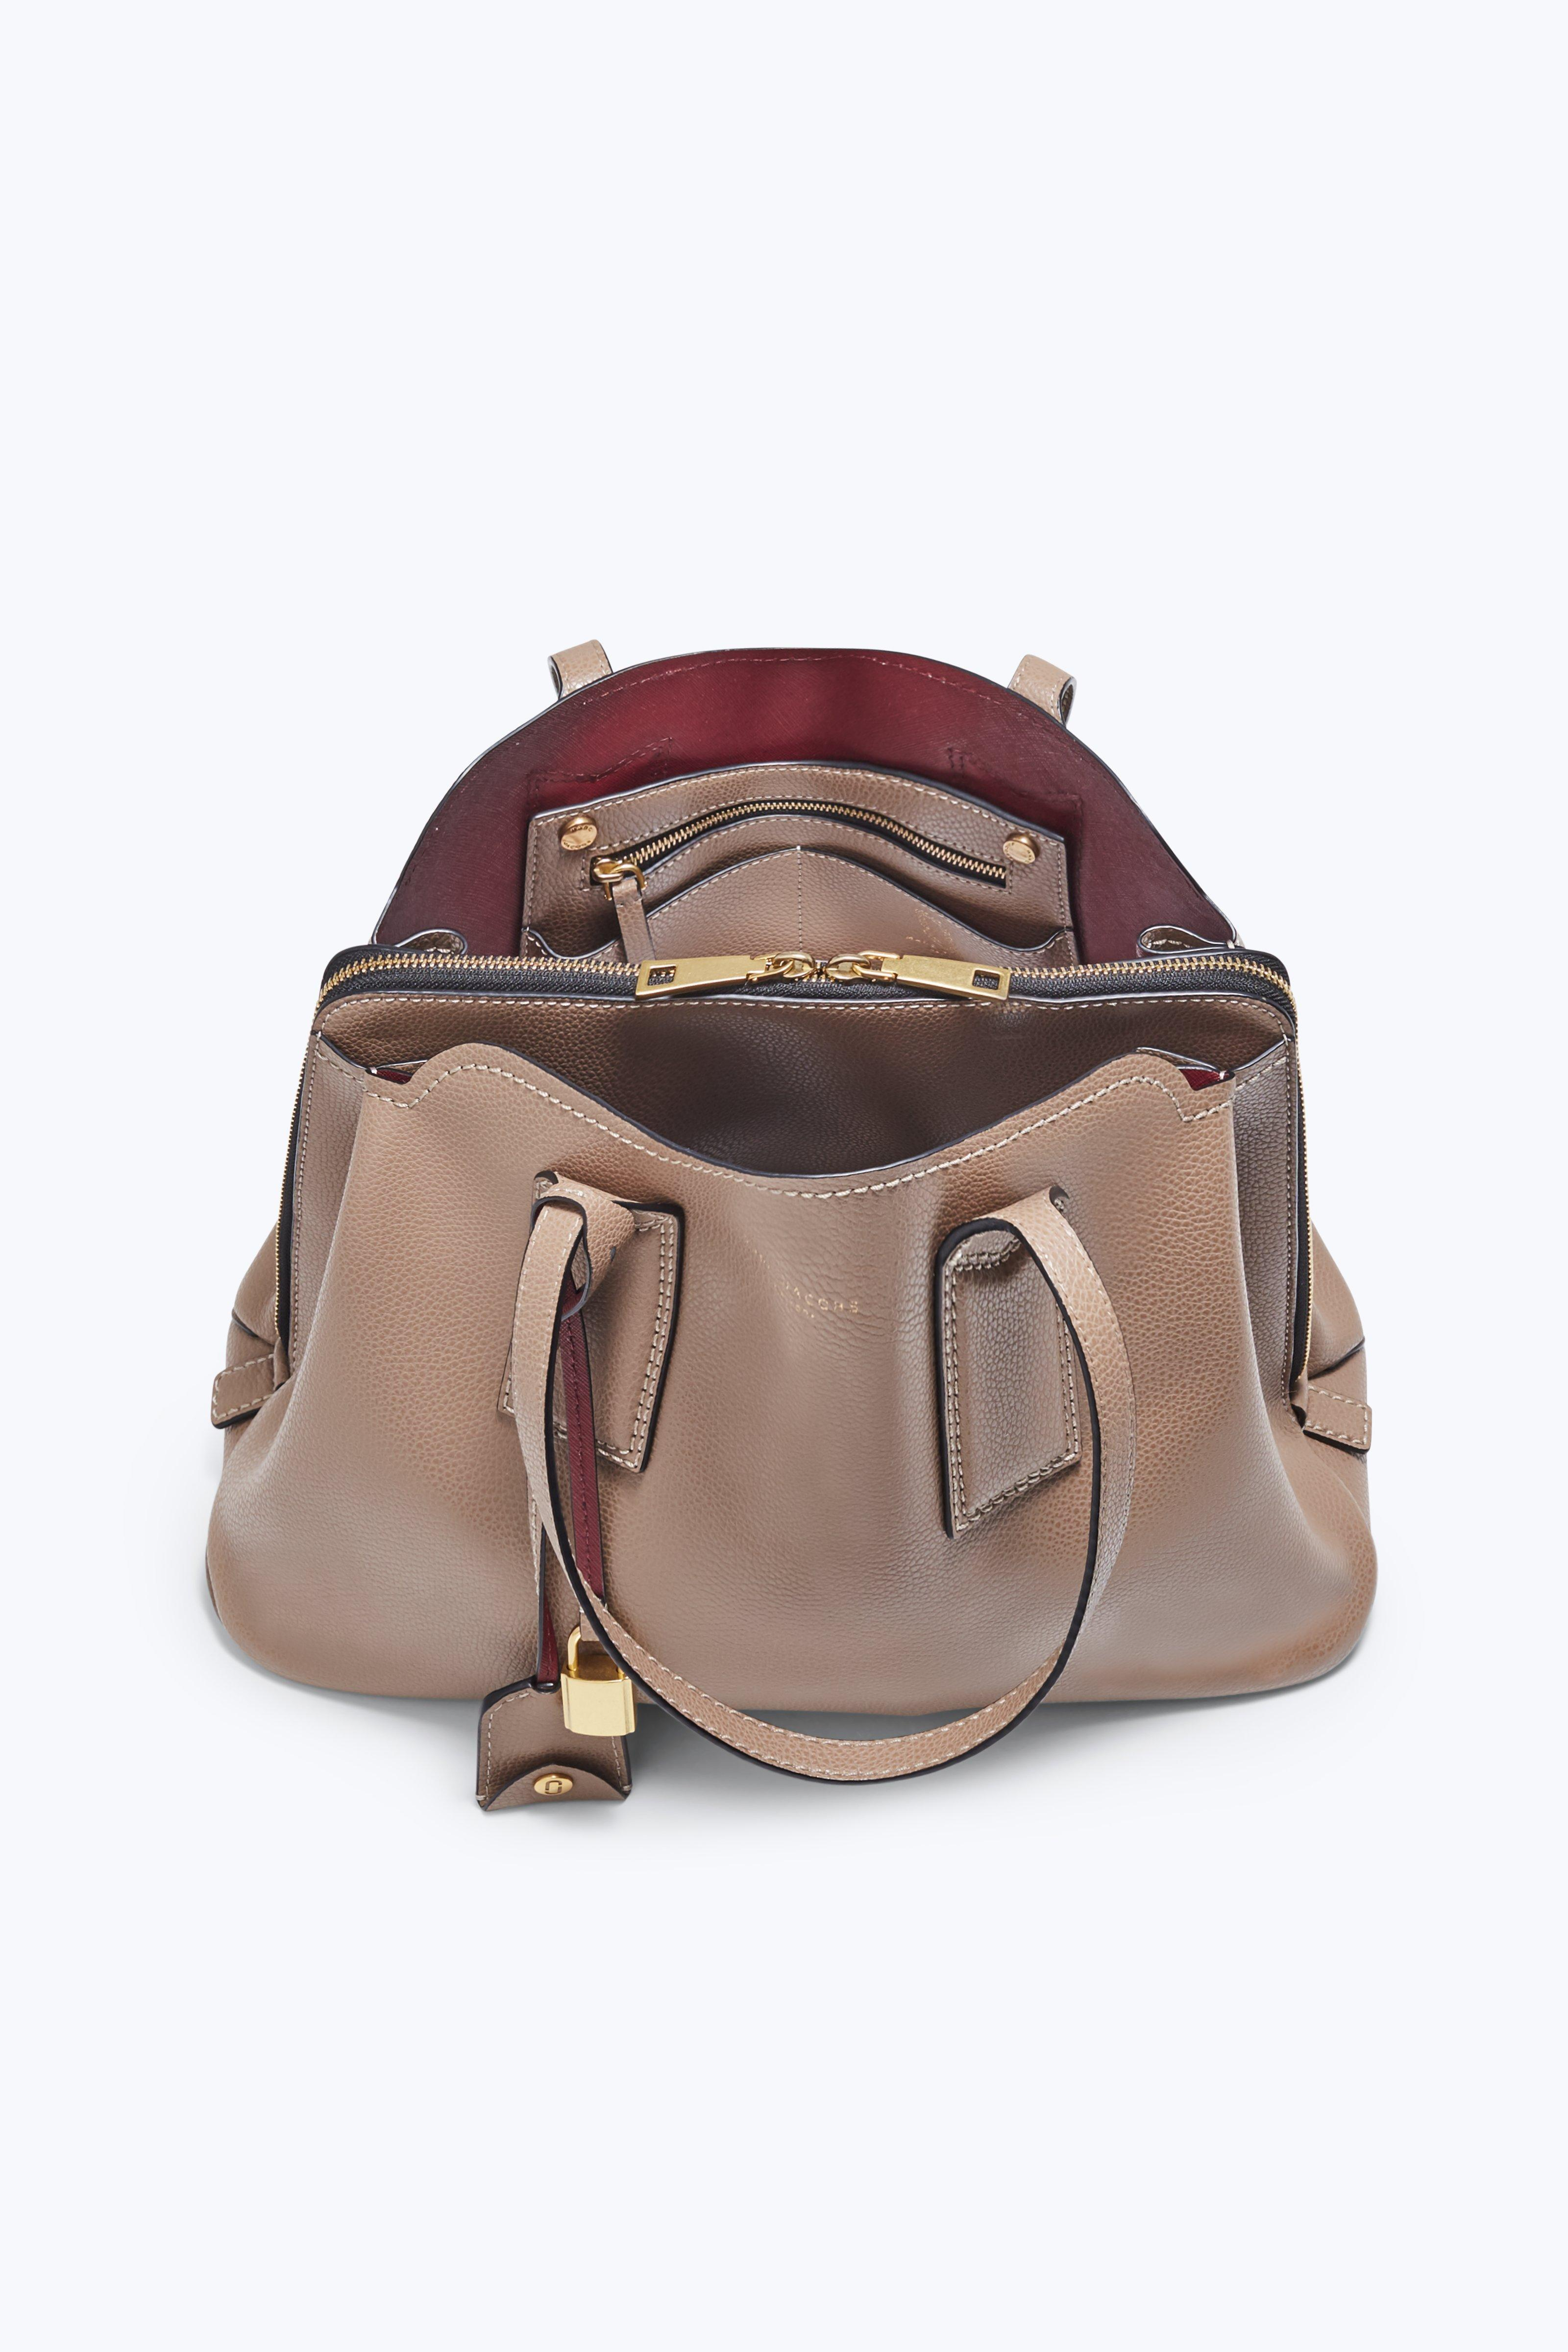 1741027a8f29 Lyst - Marc Jacobs The Editor Shoulder Bag